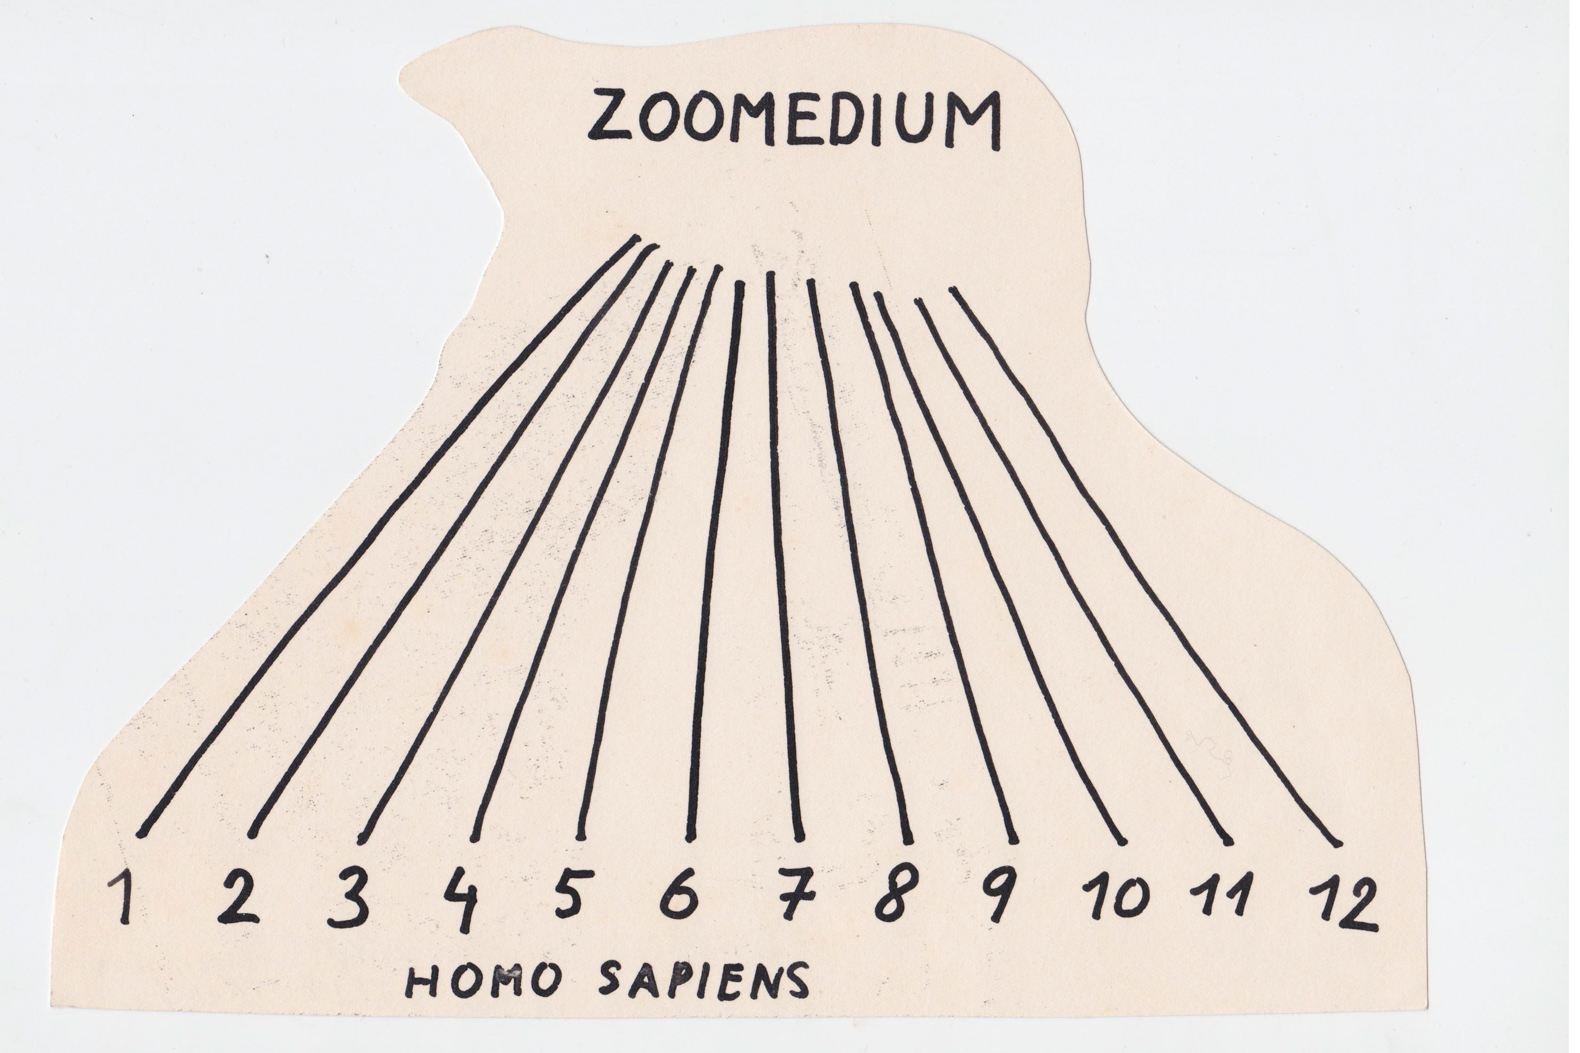 Peter Bartoš, Zoomedium, 1970's